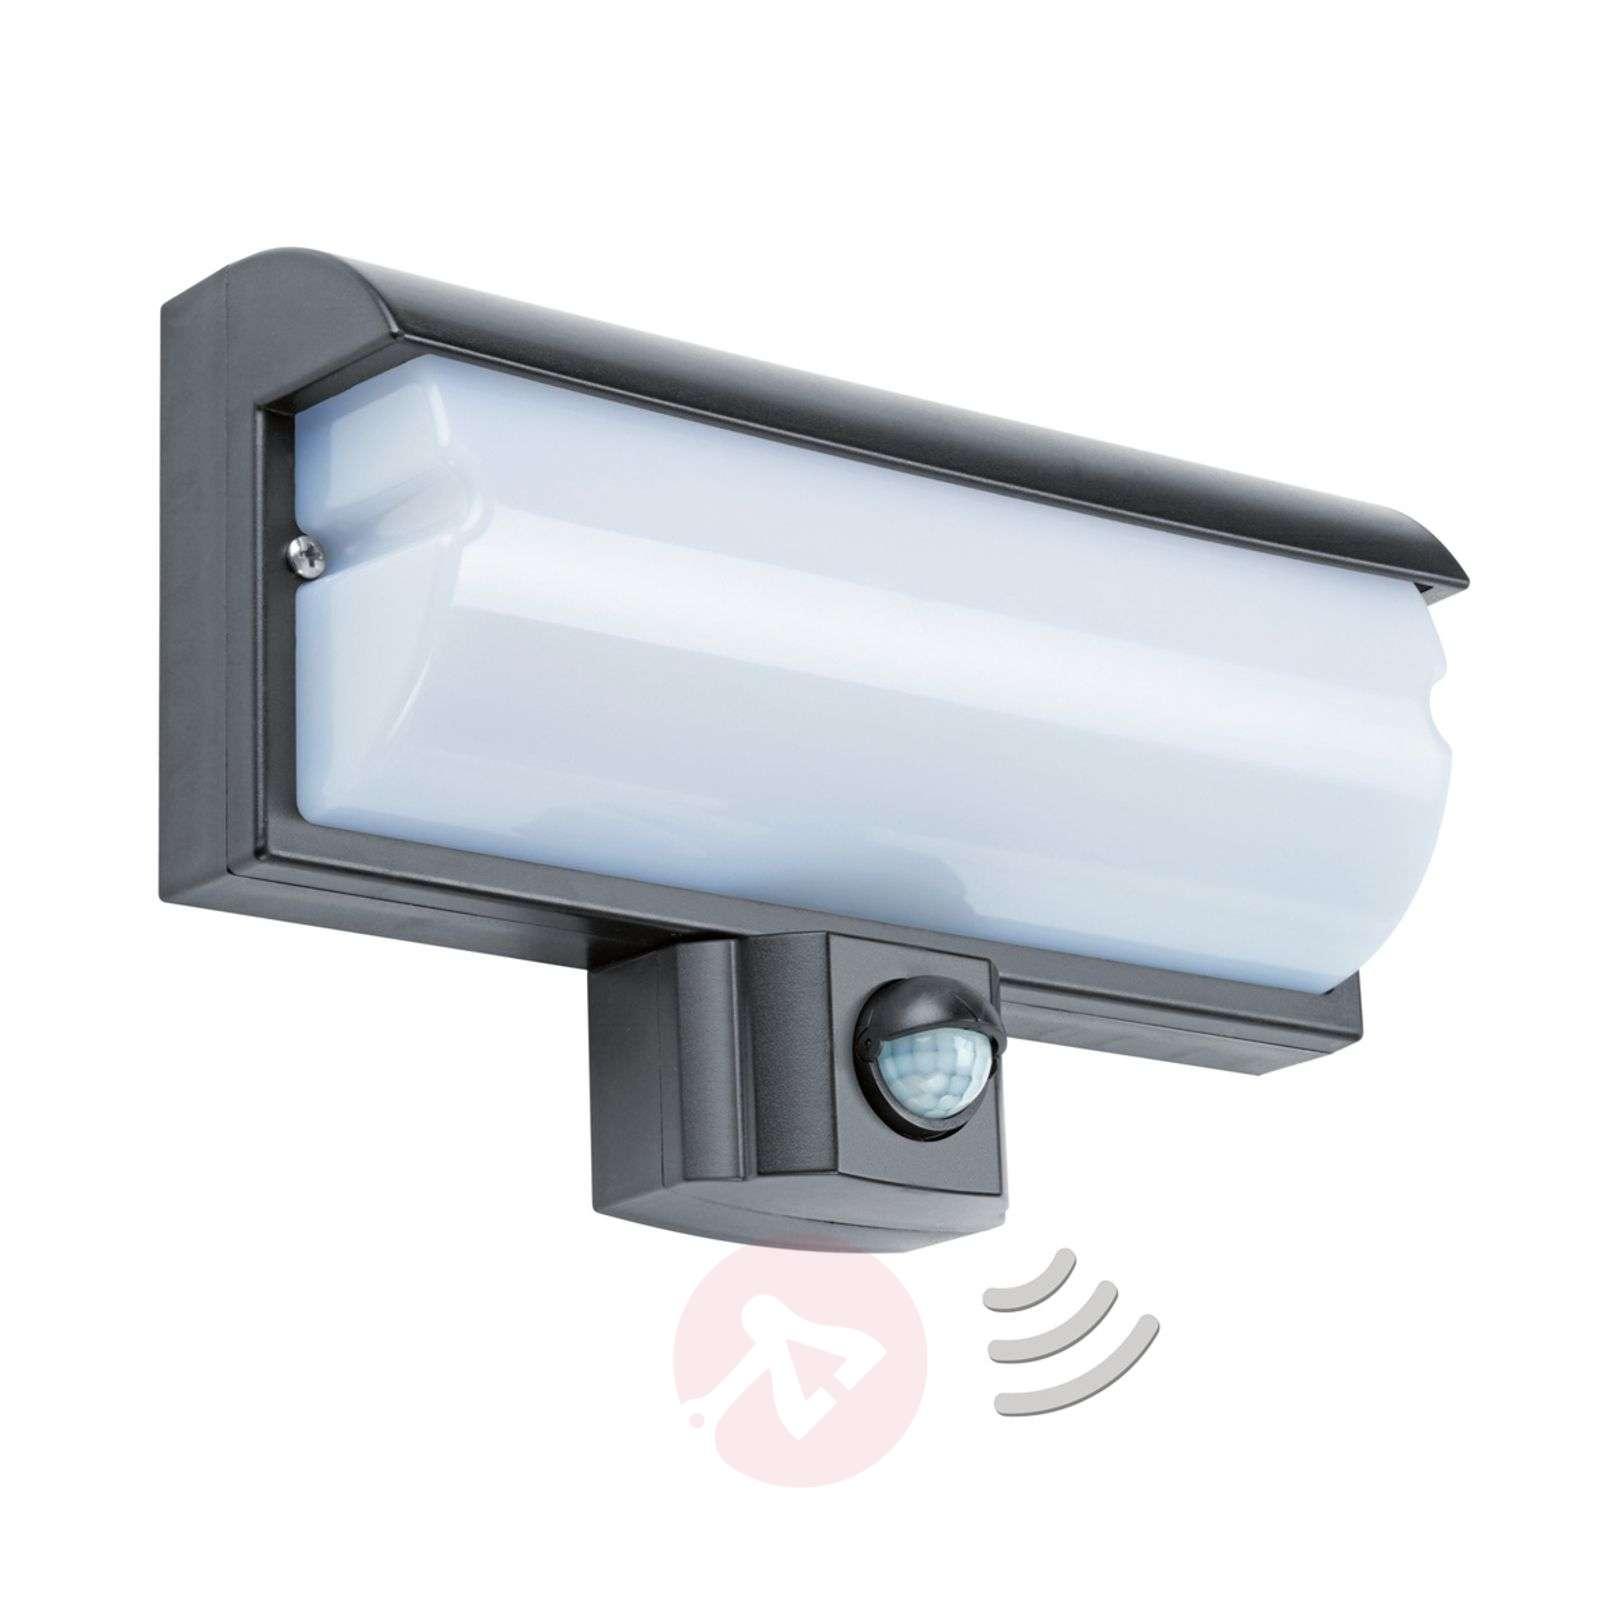 LBO 21679 -LED-seinäspotti sensorilla, IP44